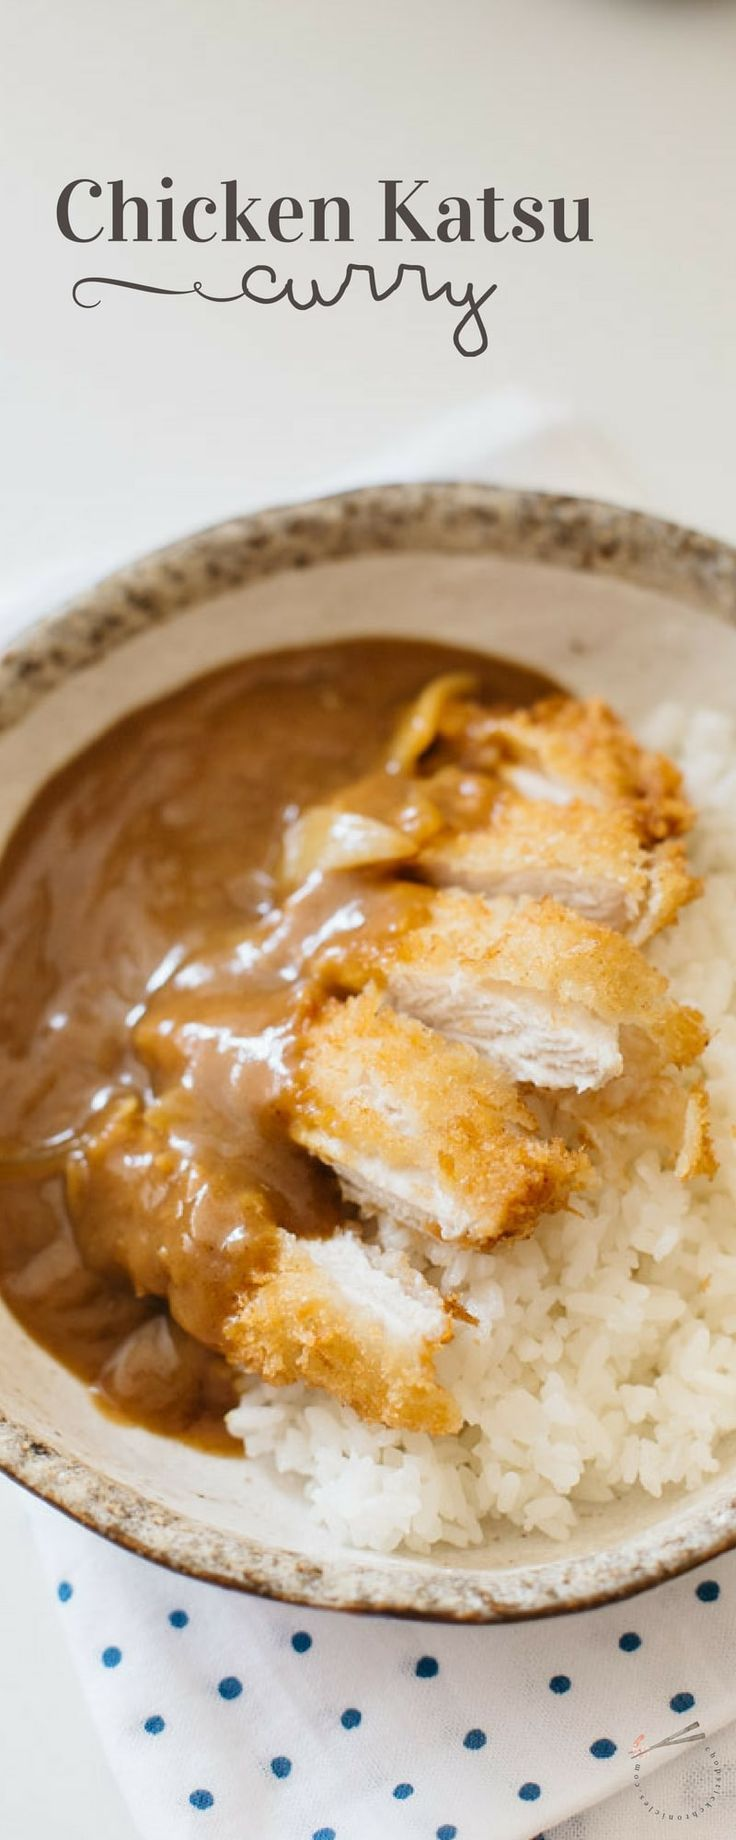 Chicken Katsu Curry Recipe Chicken Katsu Curry Recipes Easy Japanese Recipes